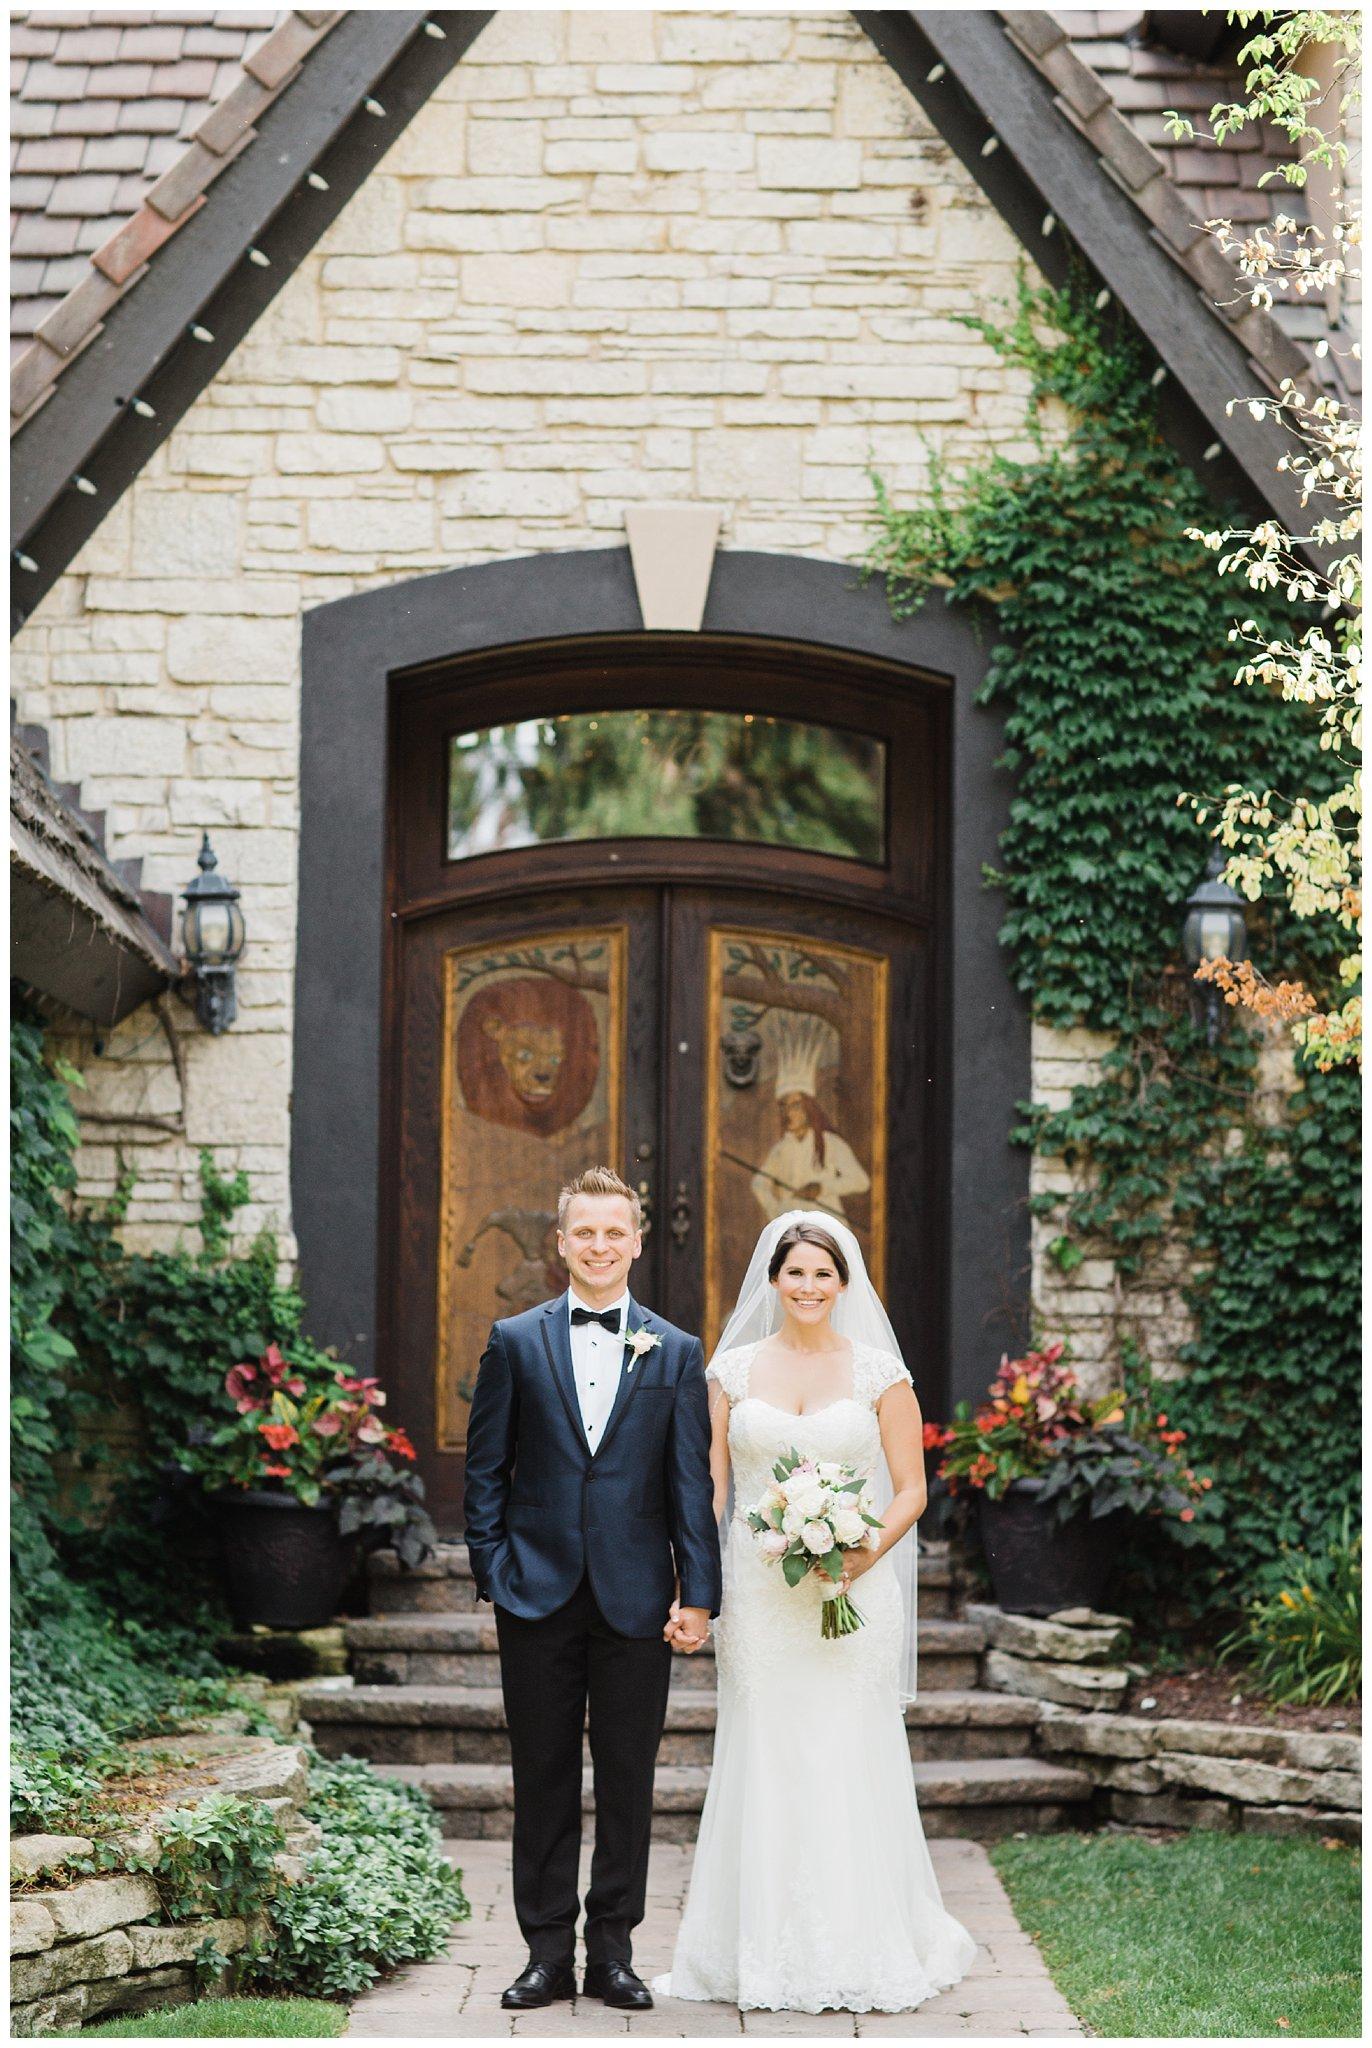 Alicia&Kurt_RavisloeCountryClubWedding_Chicagoweddingphotographer_RebeccaHaleyPhotography_0160.jpg